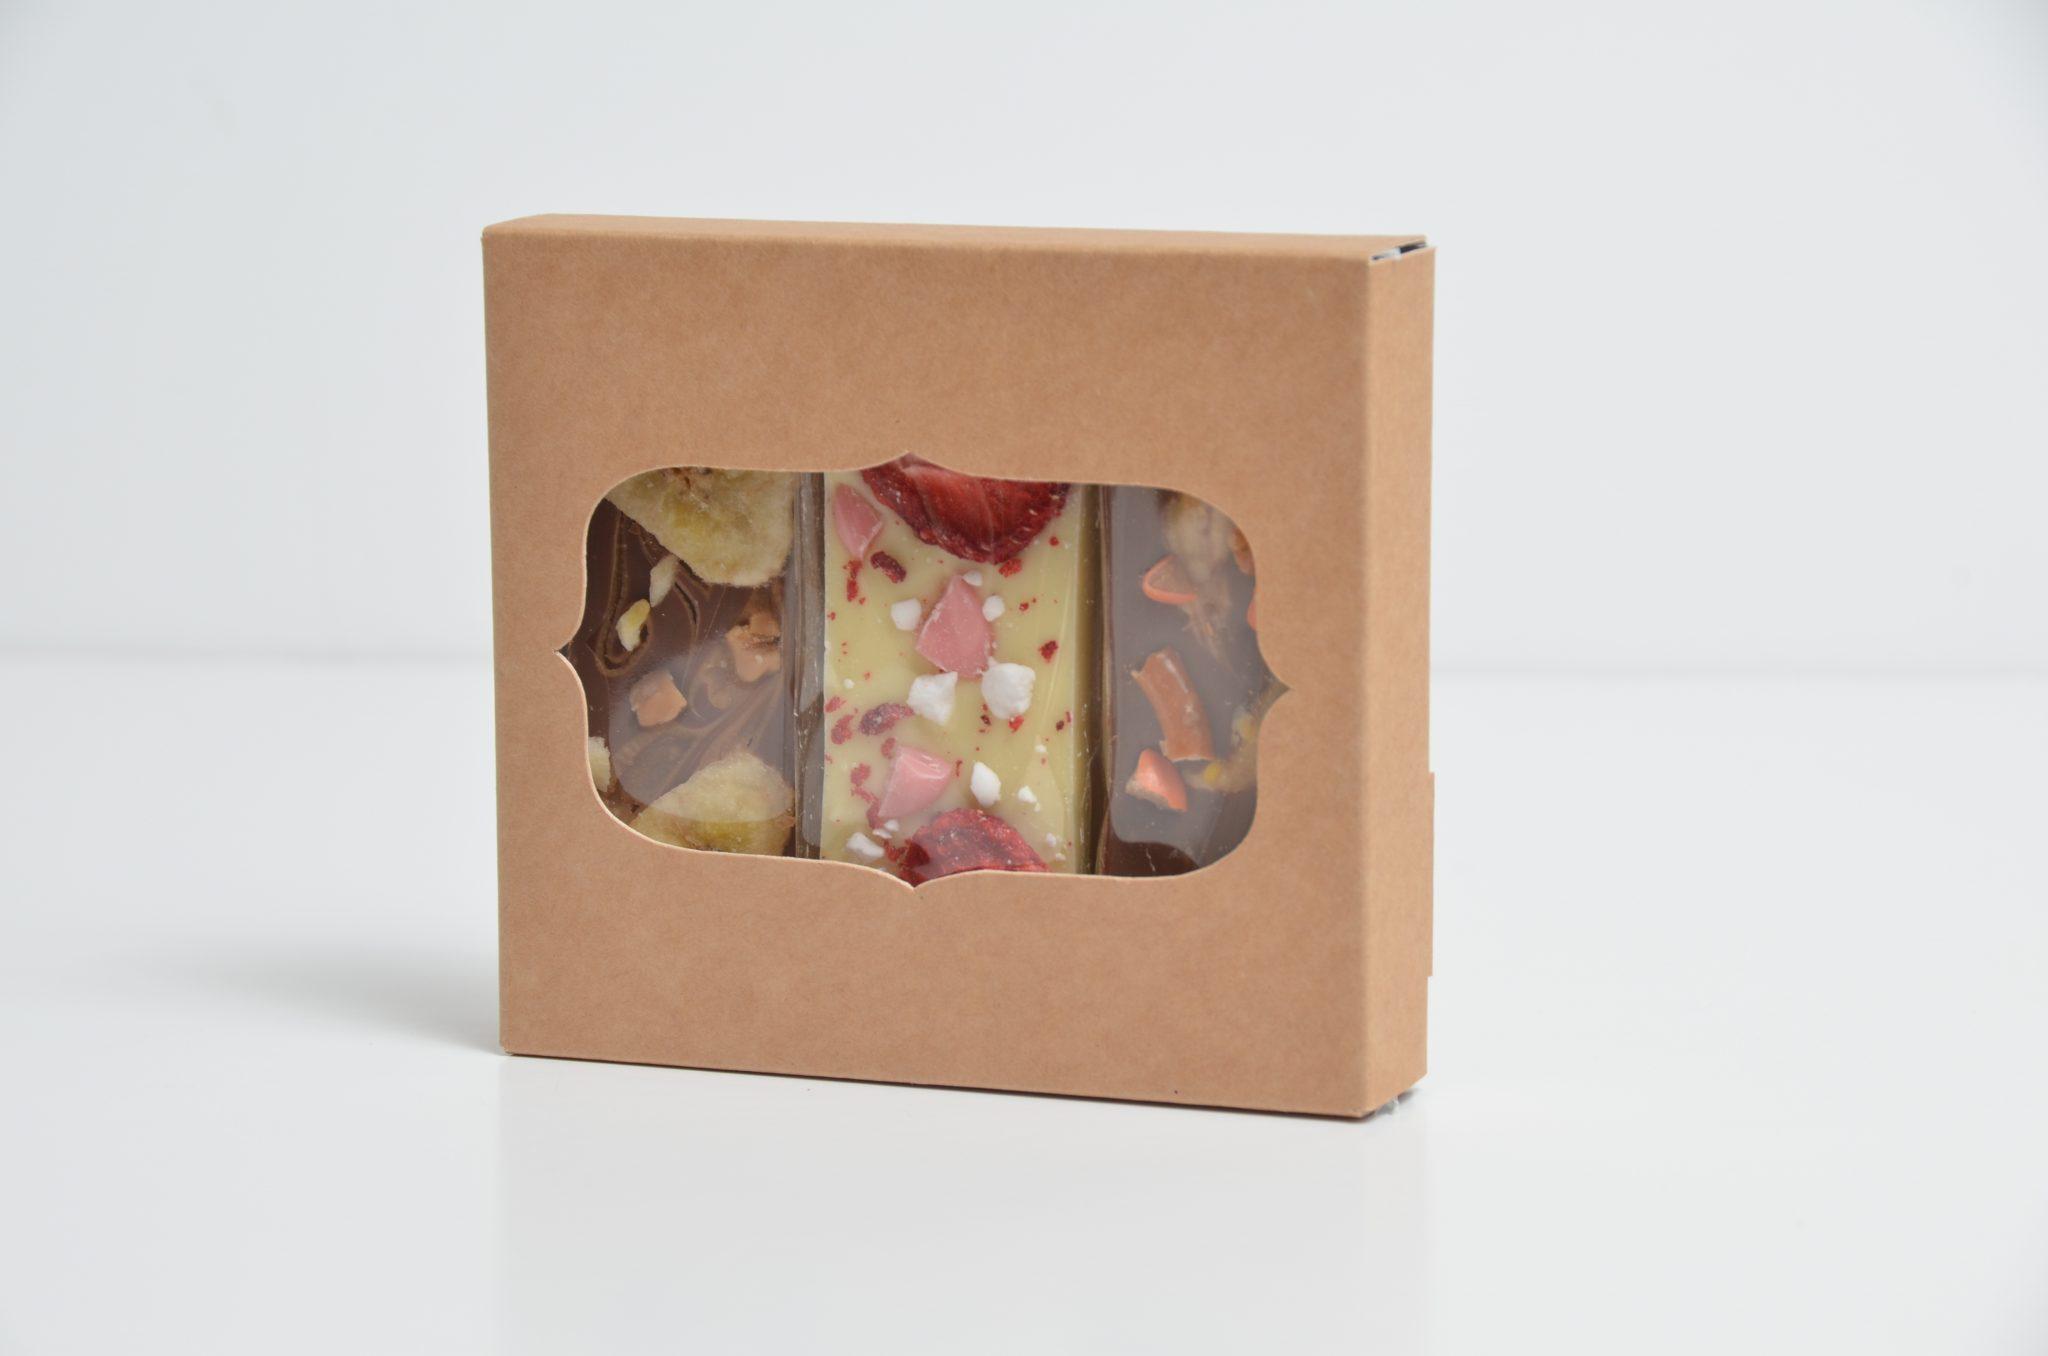 Chocolate/Fudge Slab Envelope